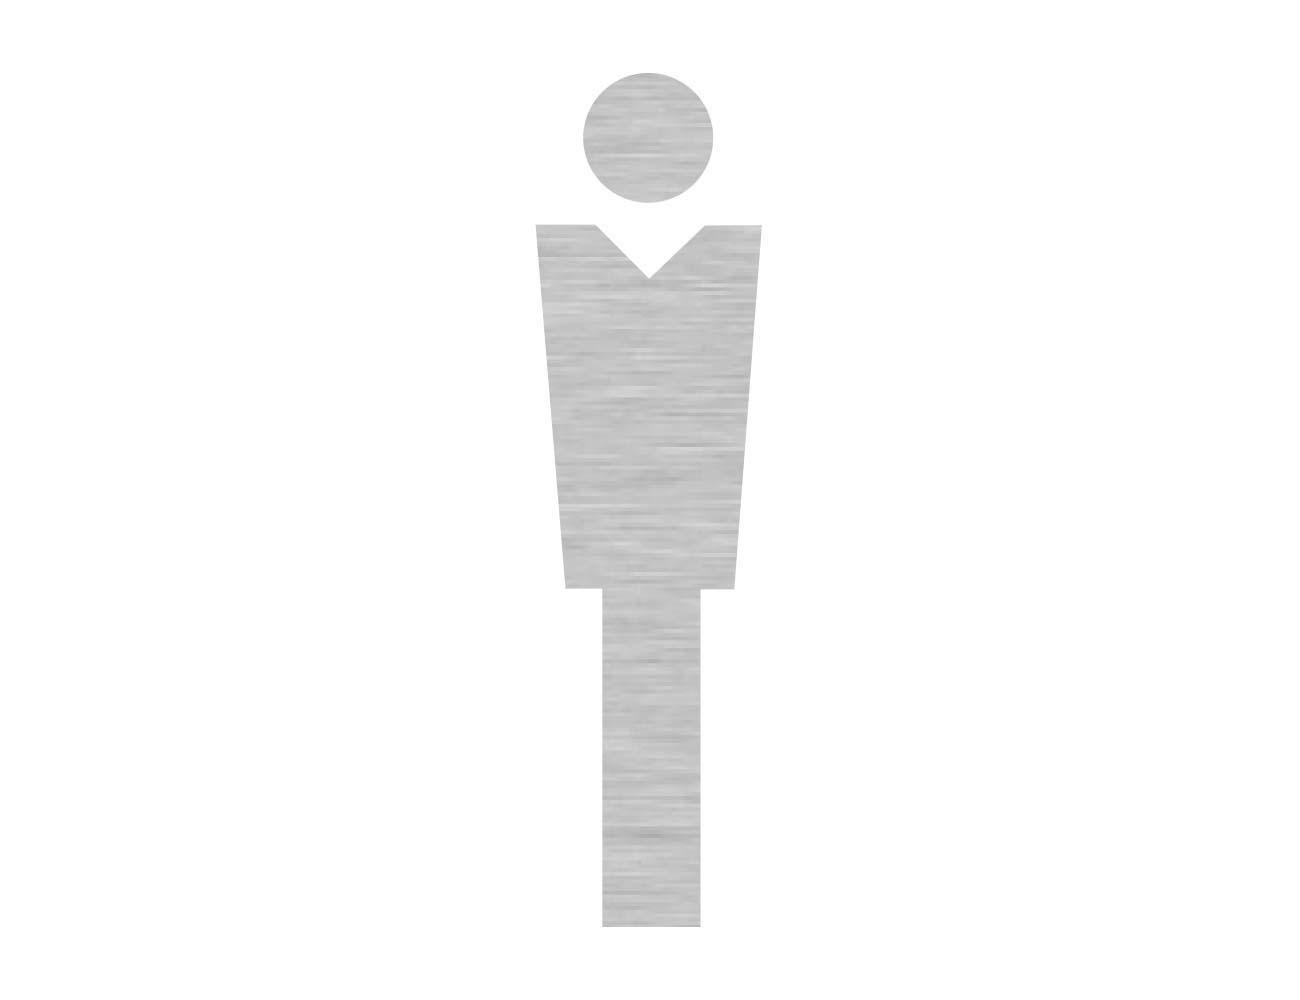 WC Piktogramme - Variante 1  - Herr